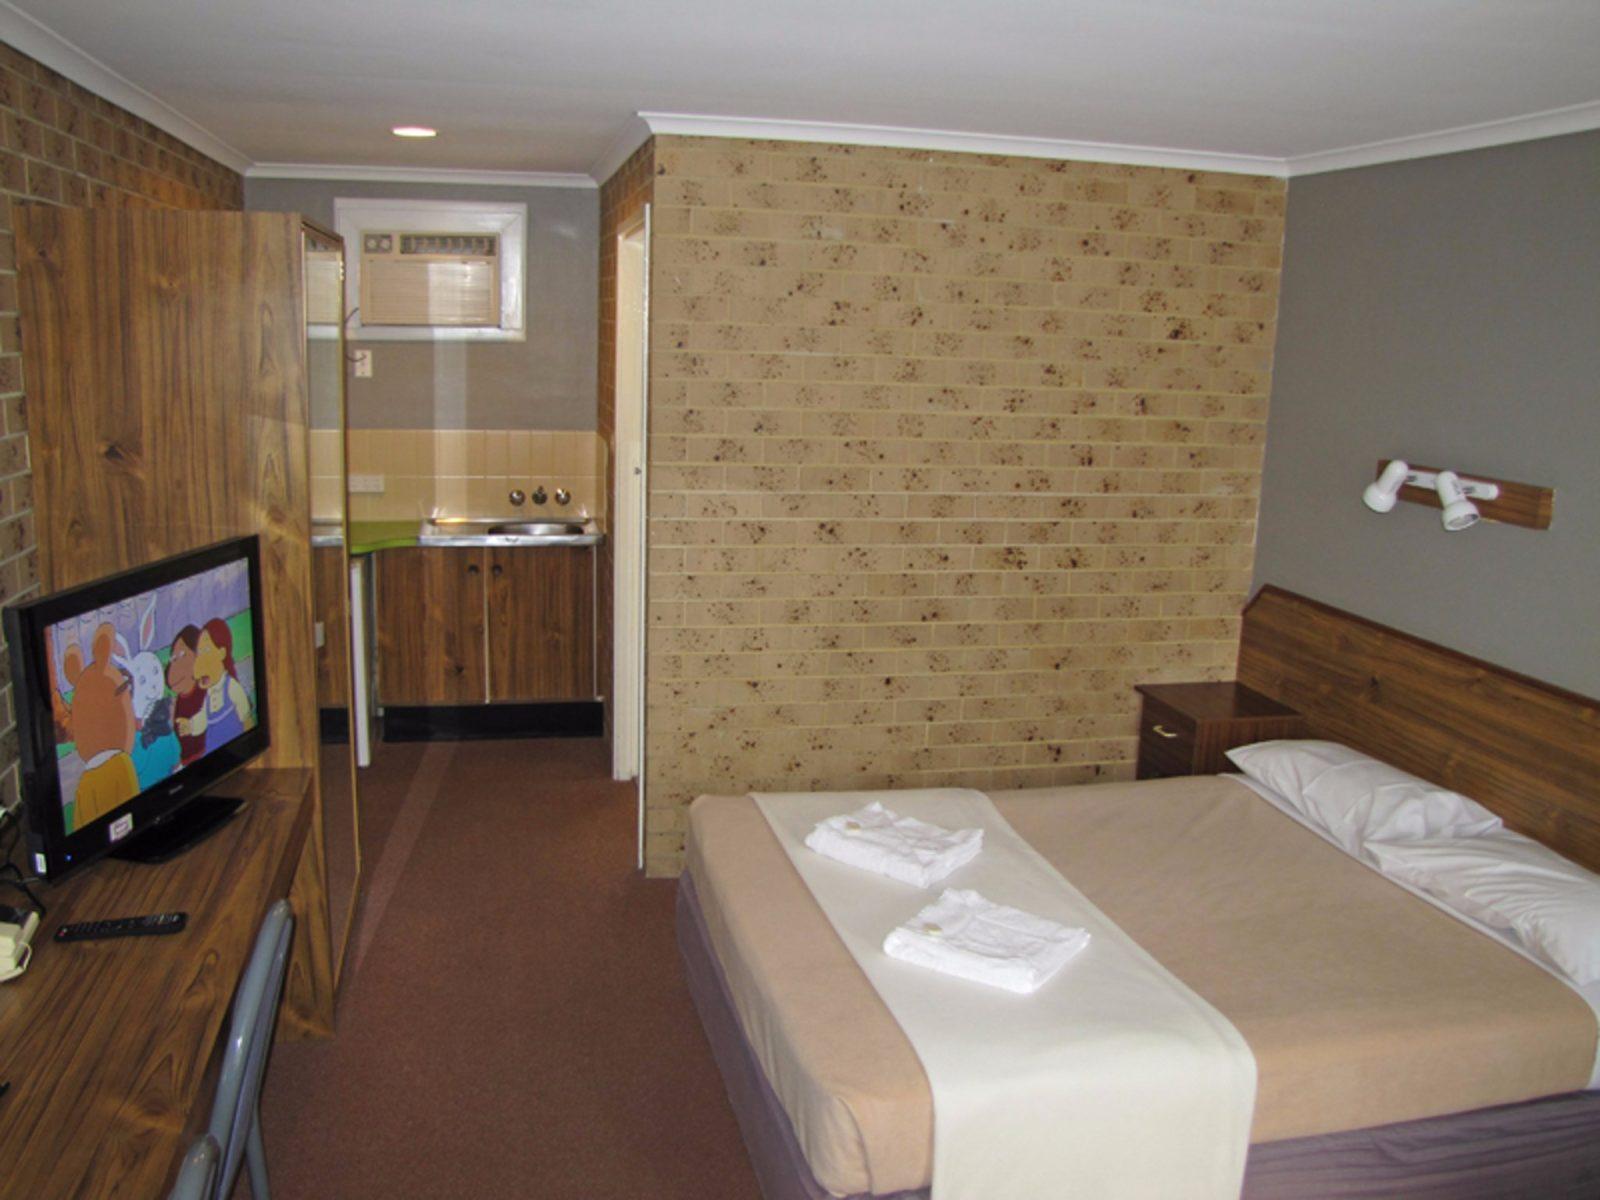 Hotel room in Hi Craft Motel